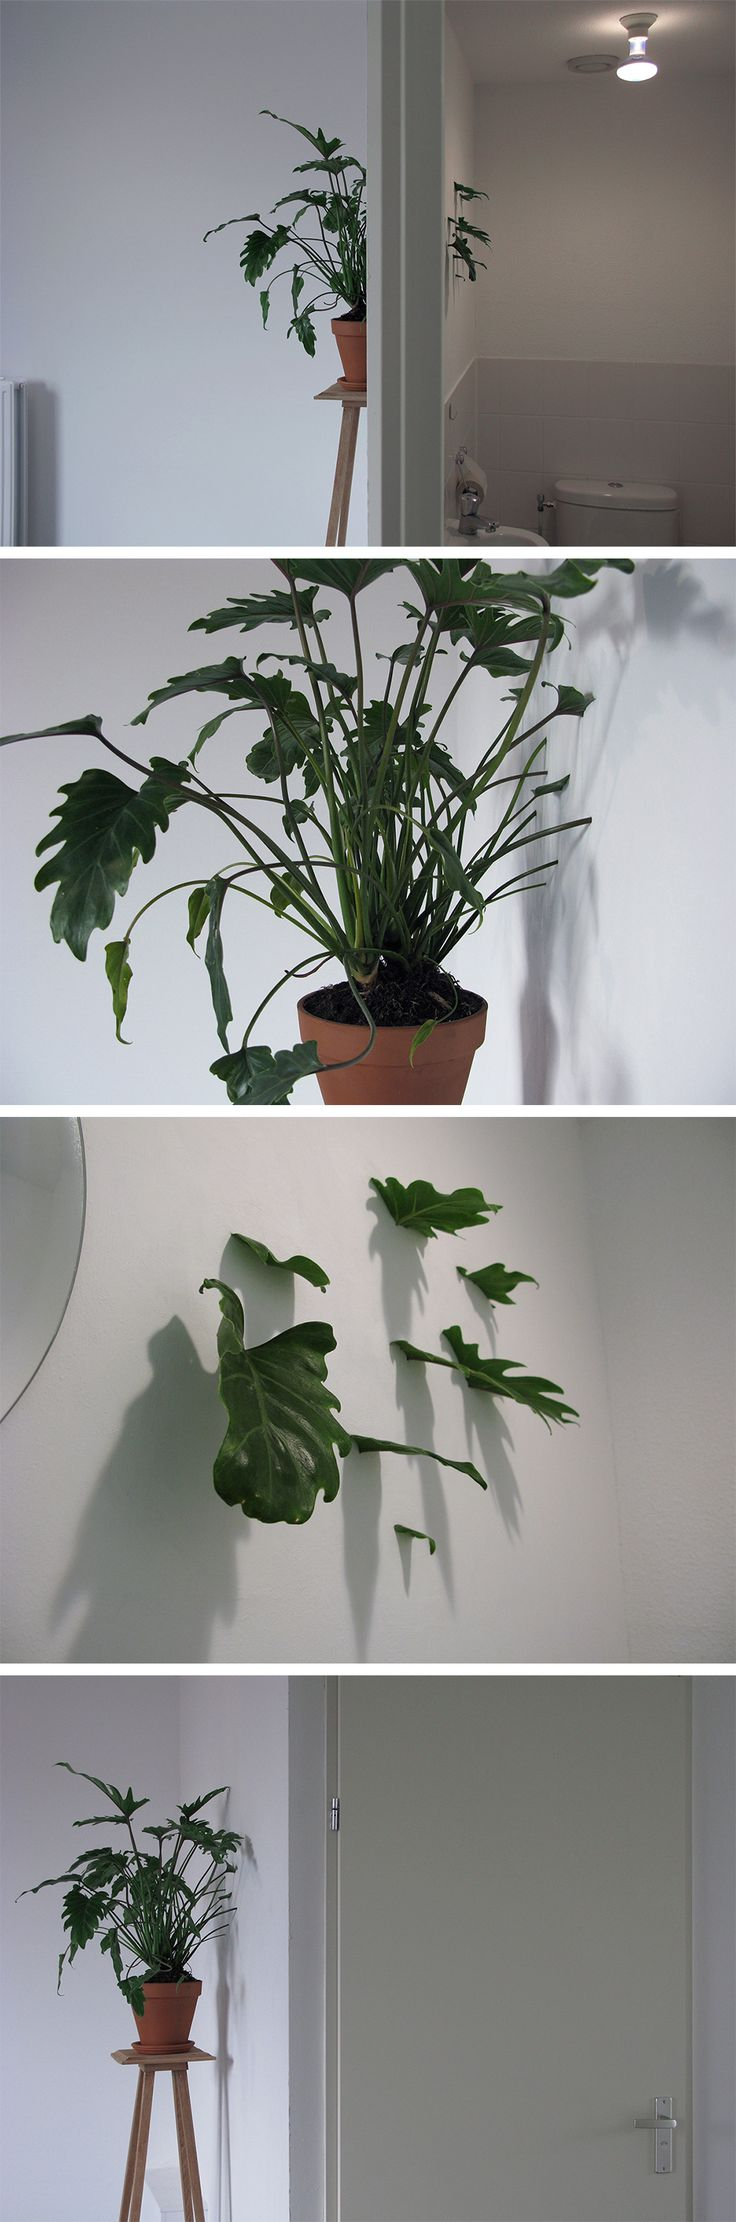 A Live Plant Grows Through Walls in Ruben Bellinkx's Site-Specific Installation